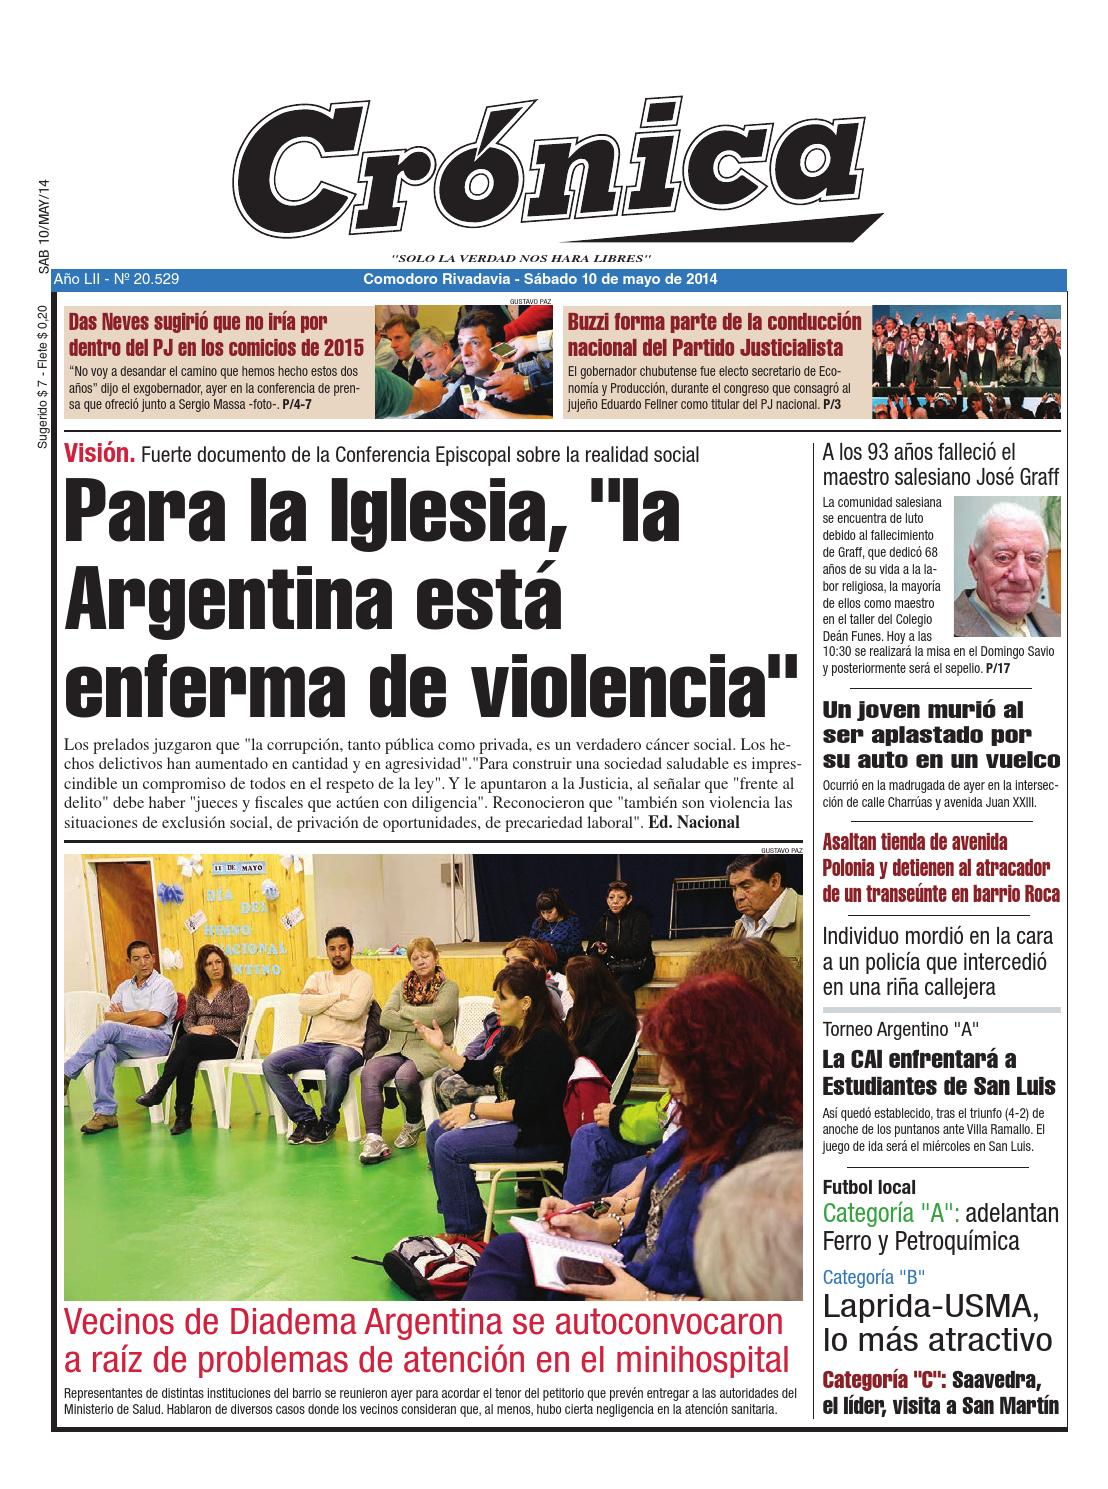 D9d967c163fd9ff00eae5146874333f0 by Diario Crónica - issuu 3cf644364f093